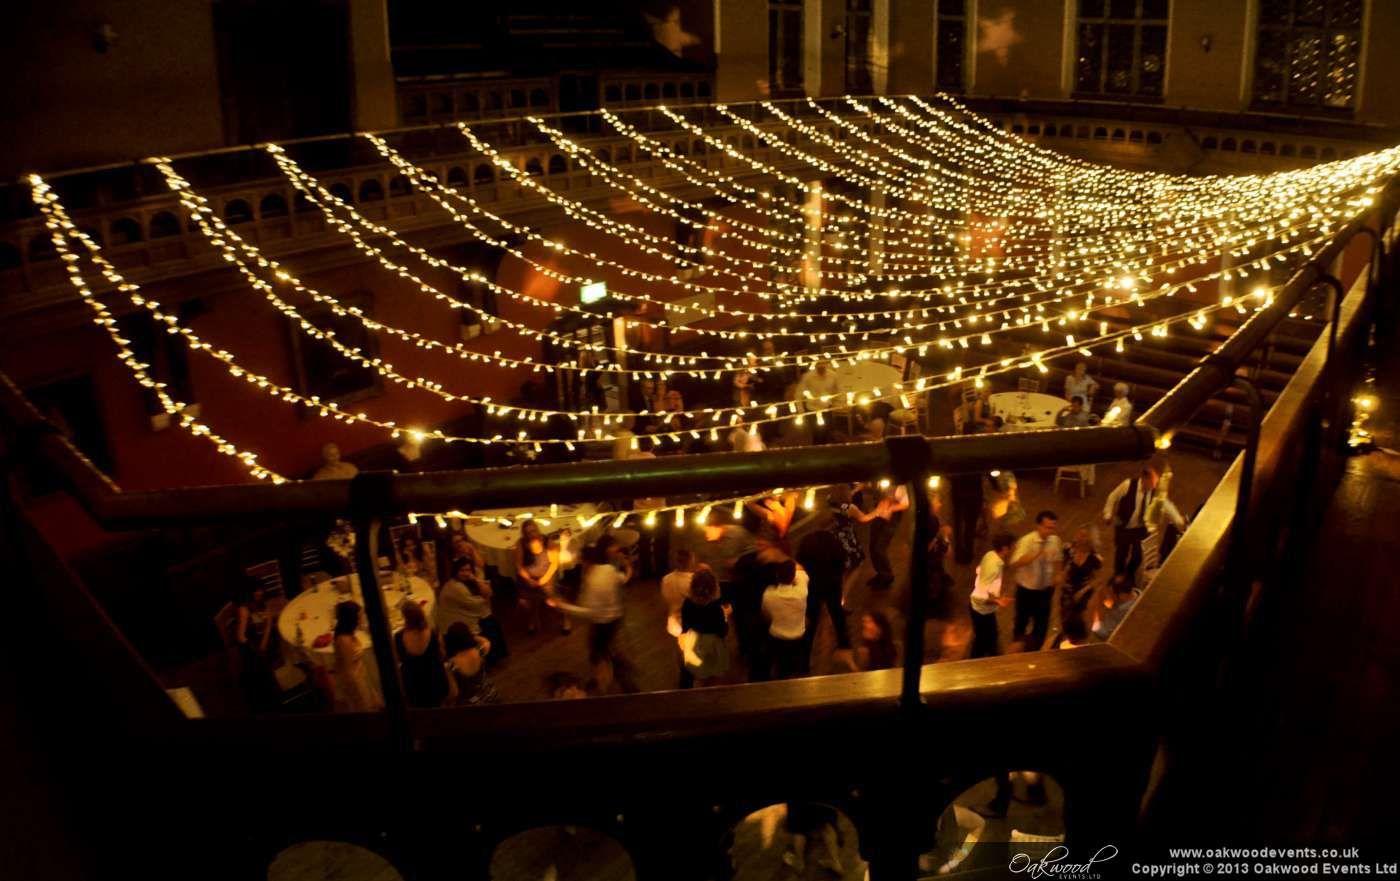 Fairy Light Canopy For An Outdoor Summer Evening Event Dreamy Fairy Lights Everywhere